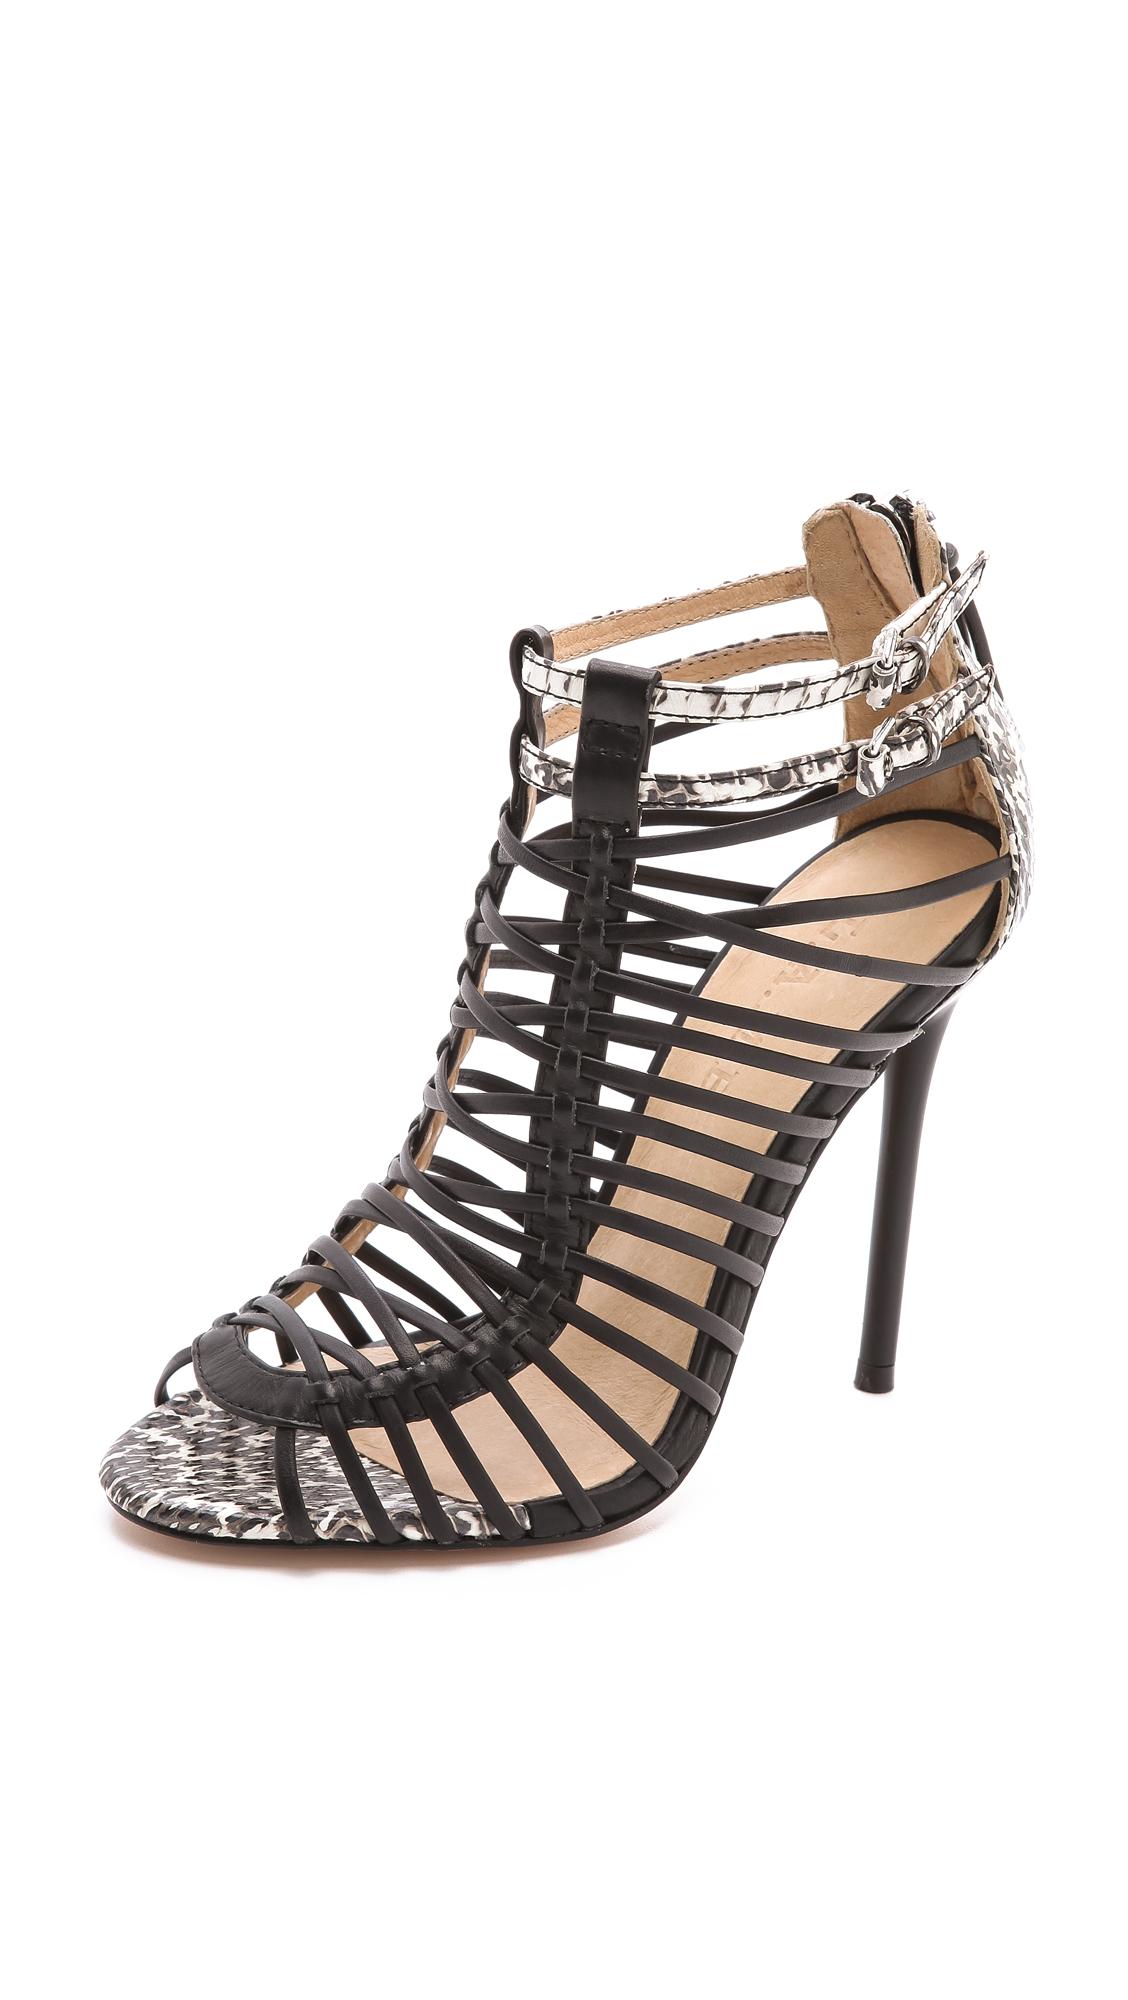 l a m b payton strappy high heel sandals in black lyst